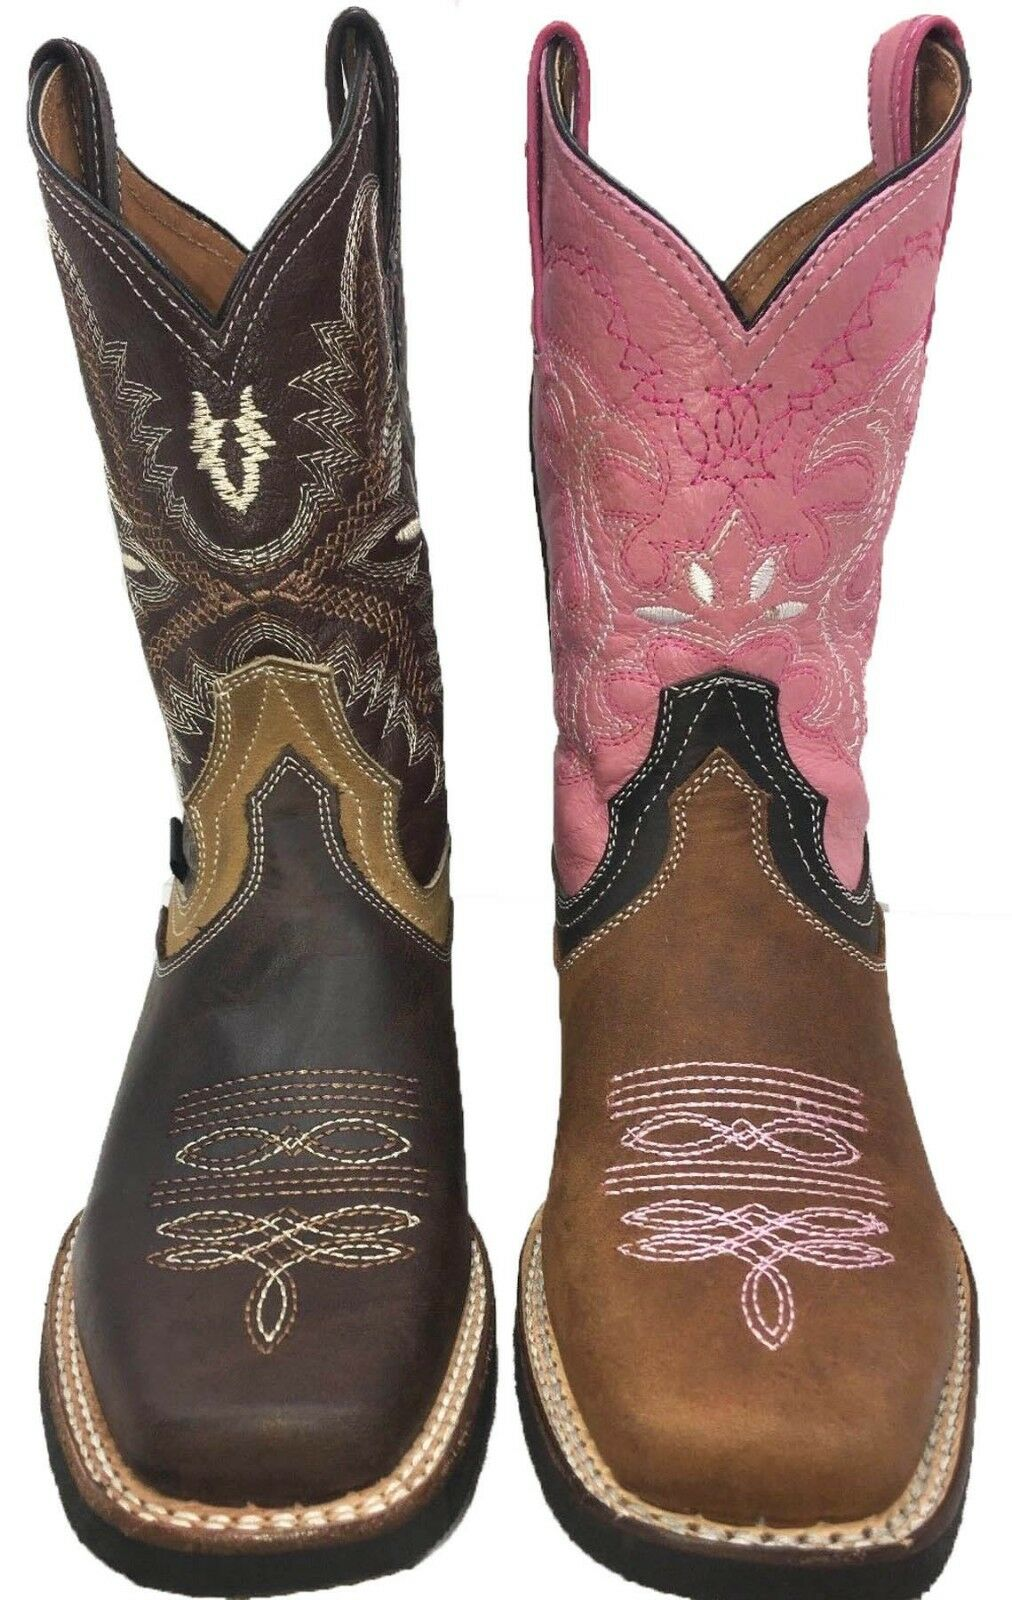 Dedo del pie cuadrado para mujer Bota Vaquera Occidental